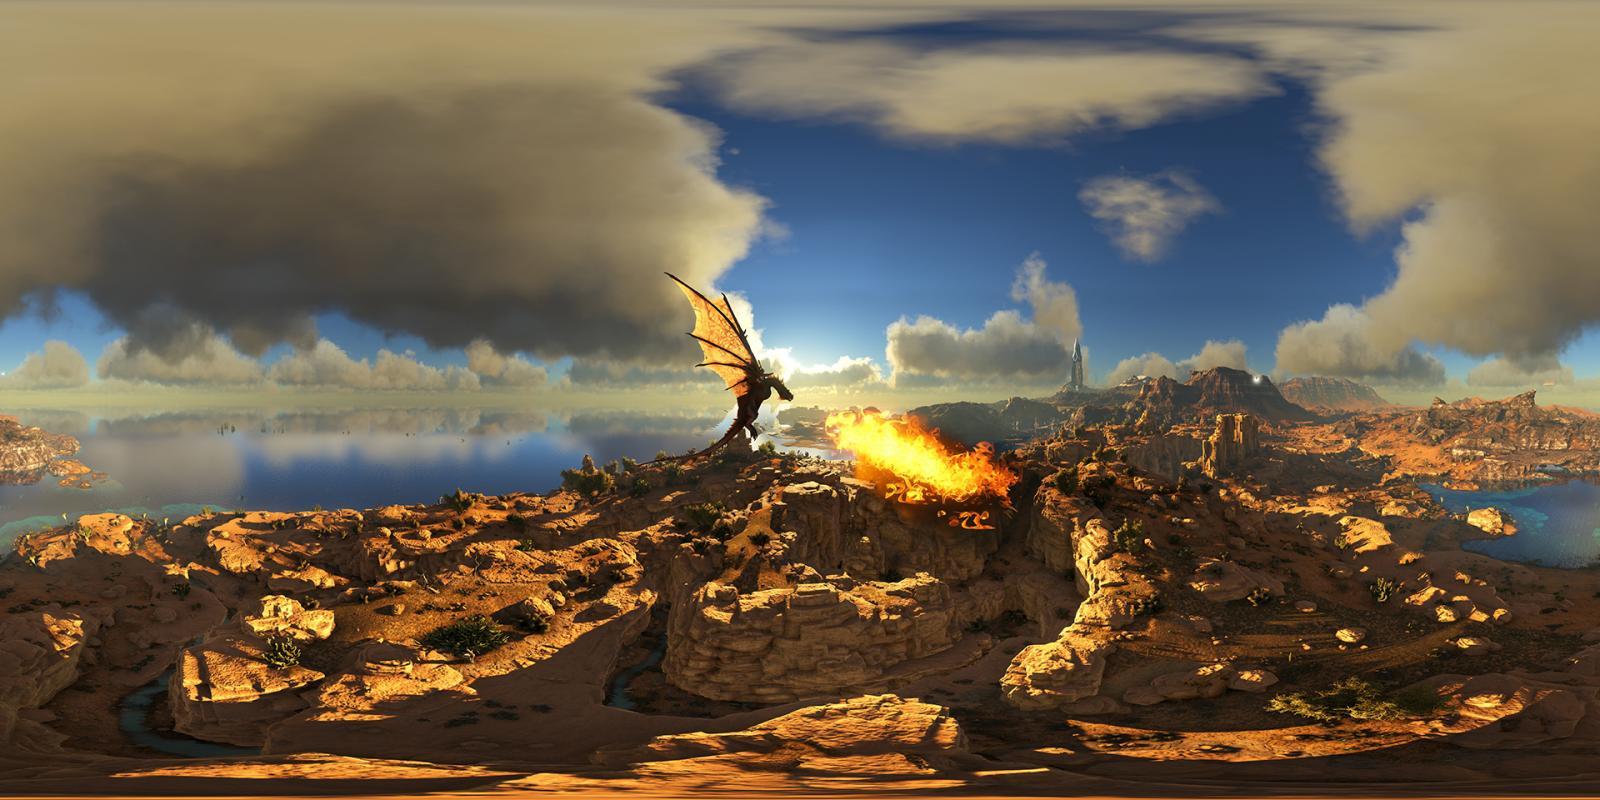 large.59e14aed92413_Vakarian-NewRagnarokDessertBiom-Panoramic360Stereoscopic3D.jpg